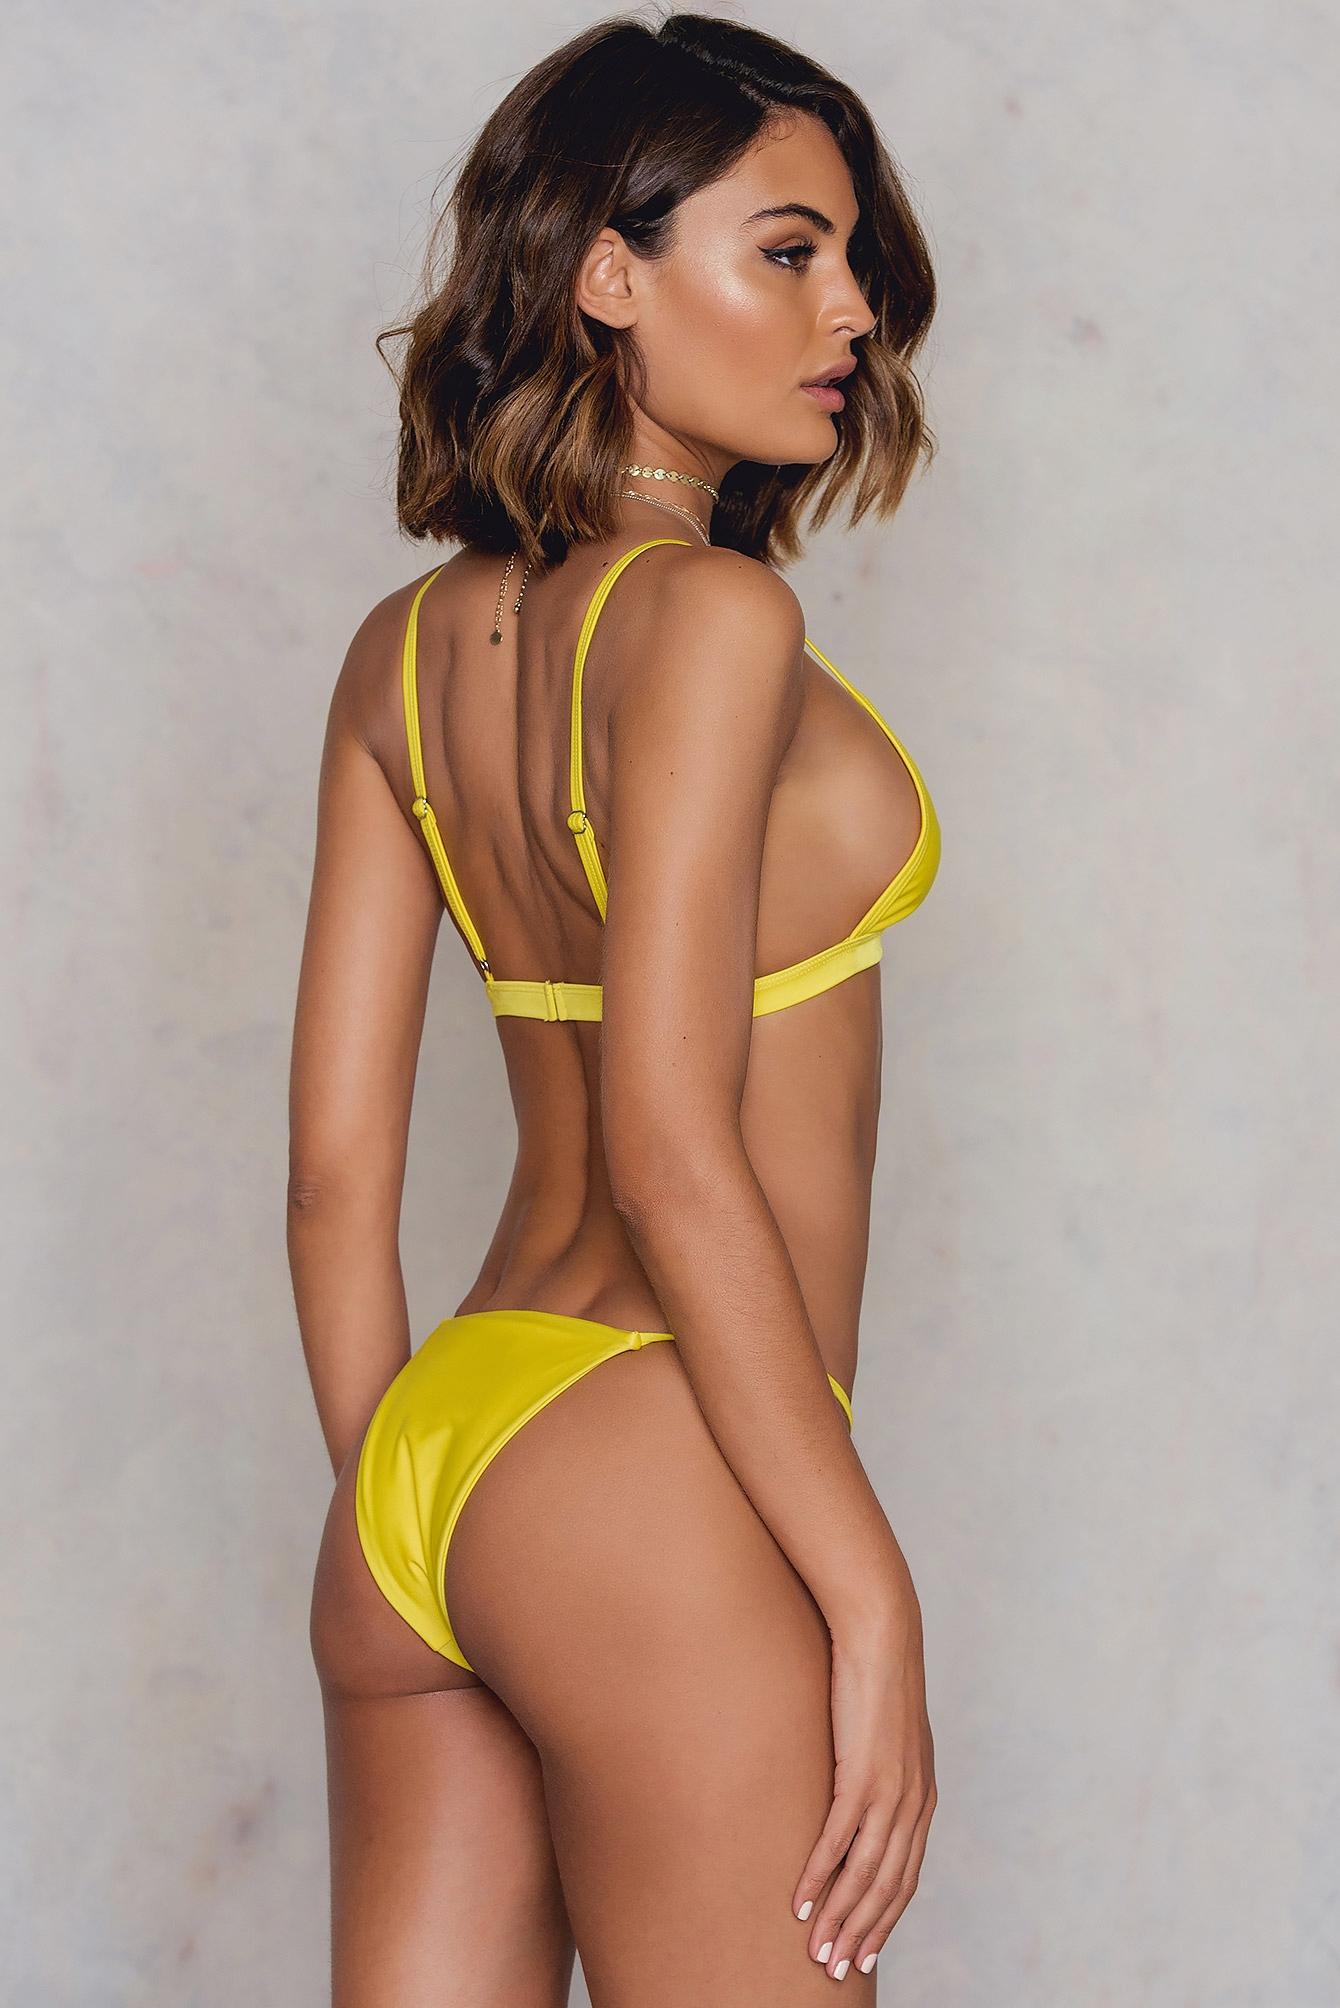 Brazillian Bikini Model